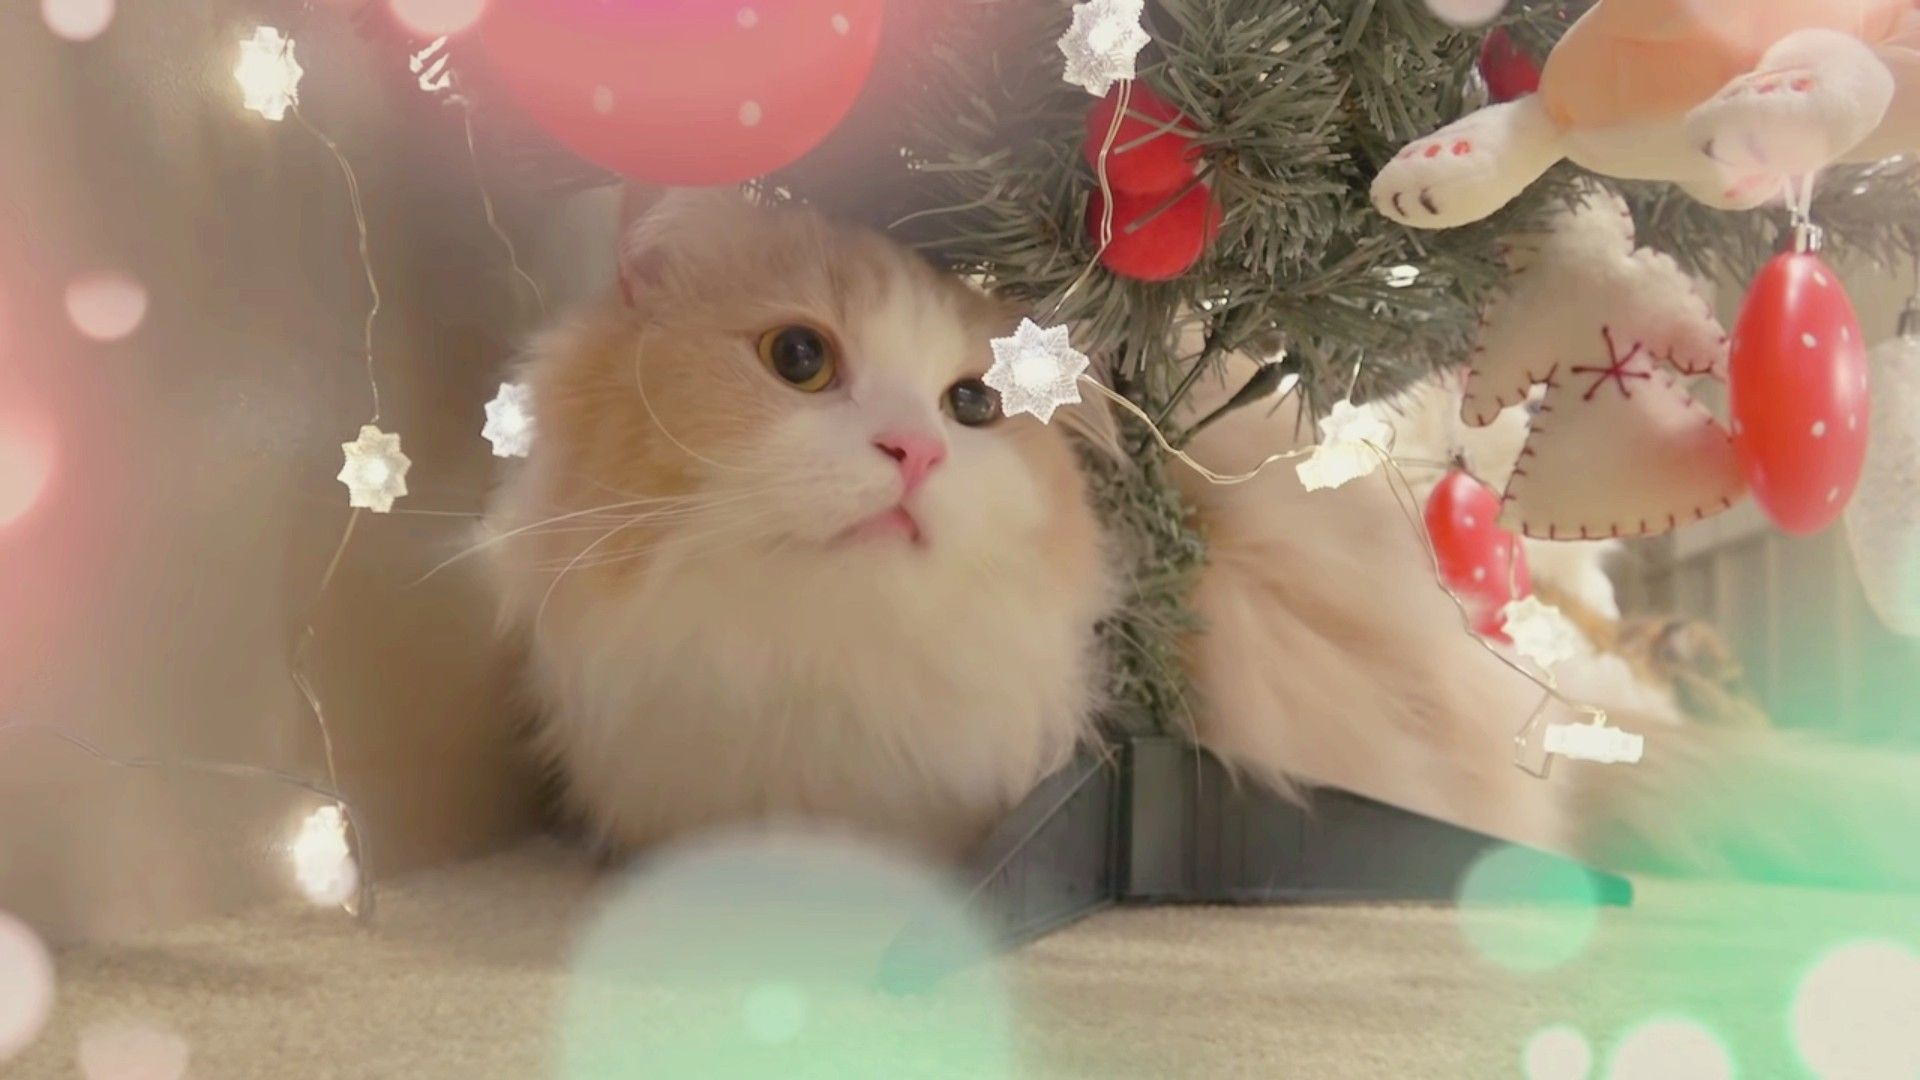 Merry Christmas Creamheroes